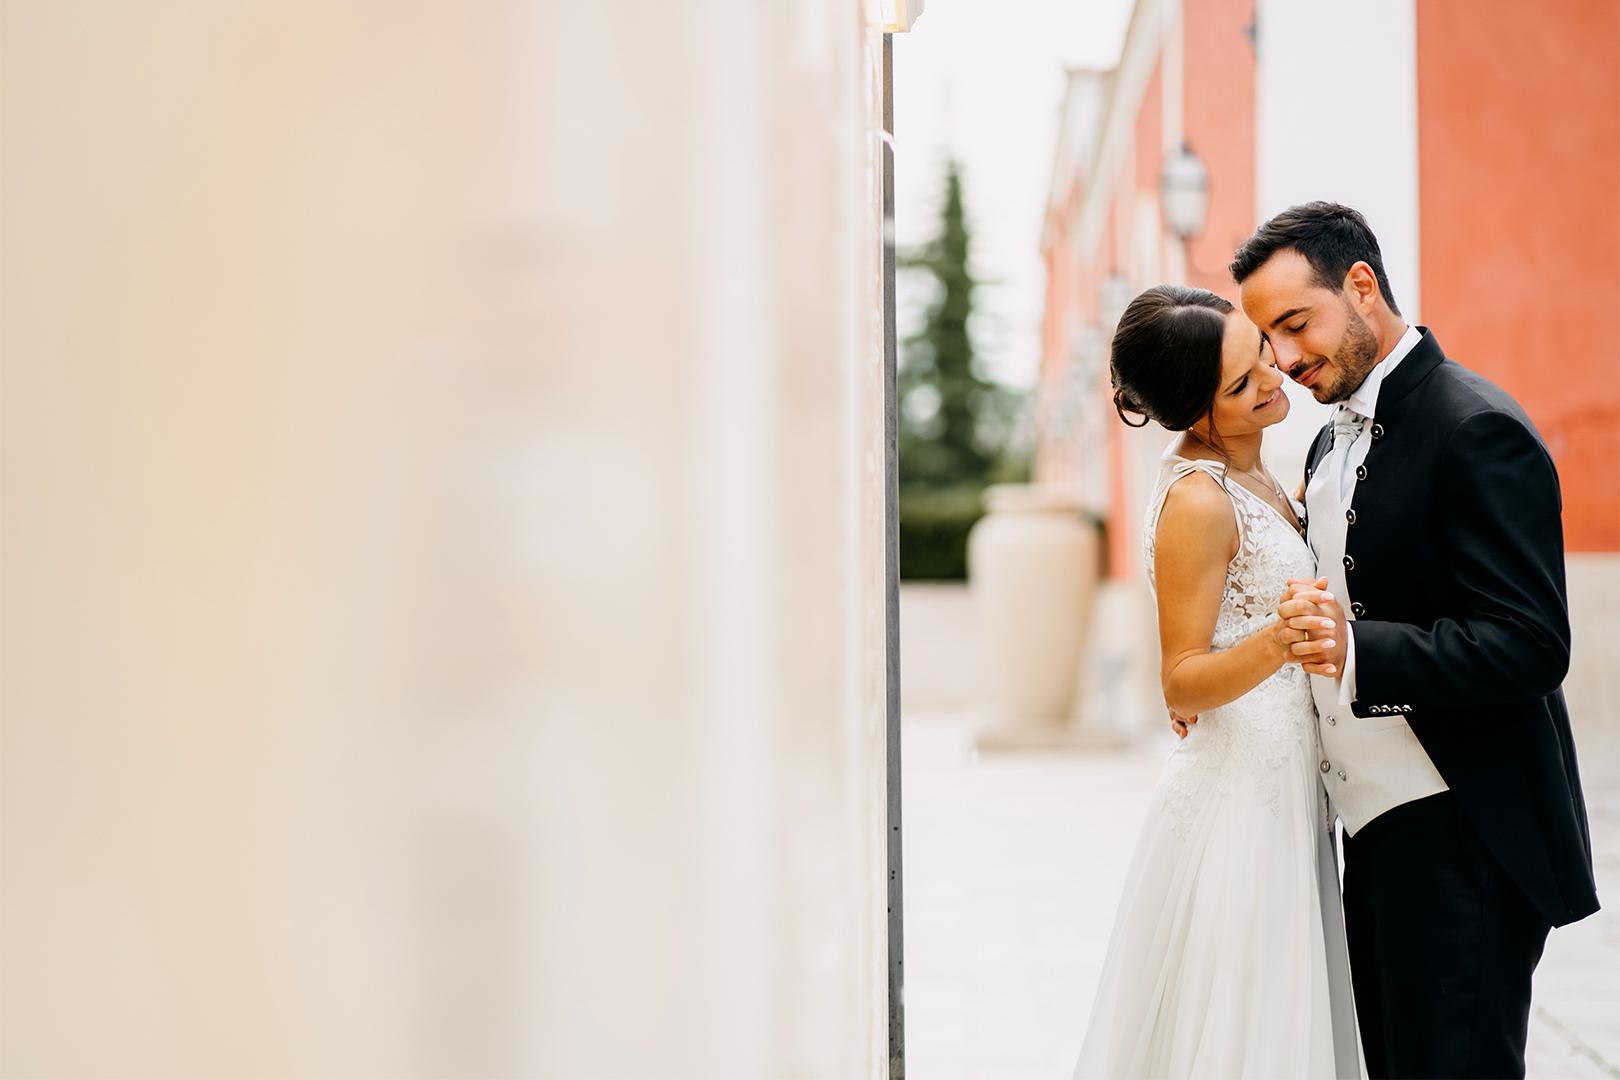 53 gianni-lepore-torre-giulia-cerignola-matrimonio